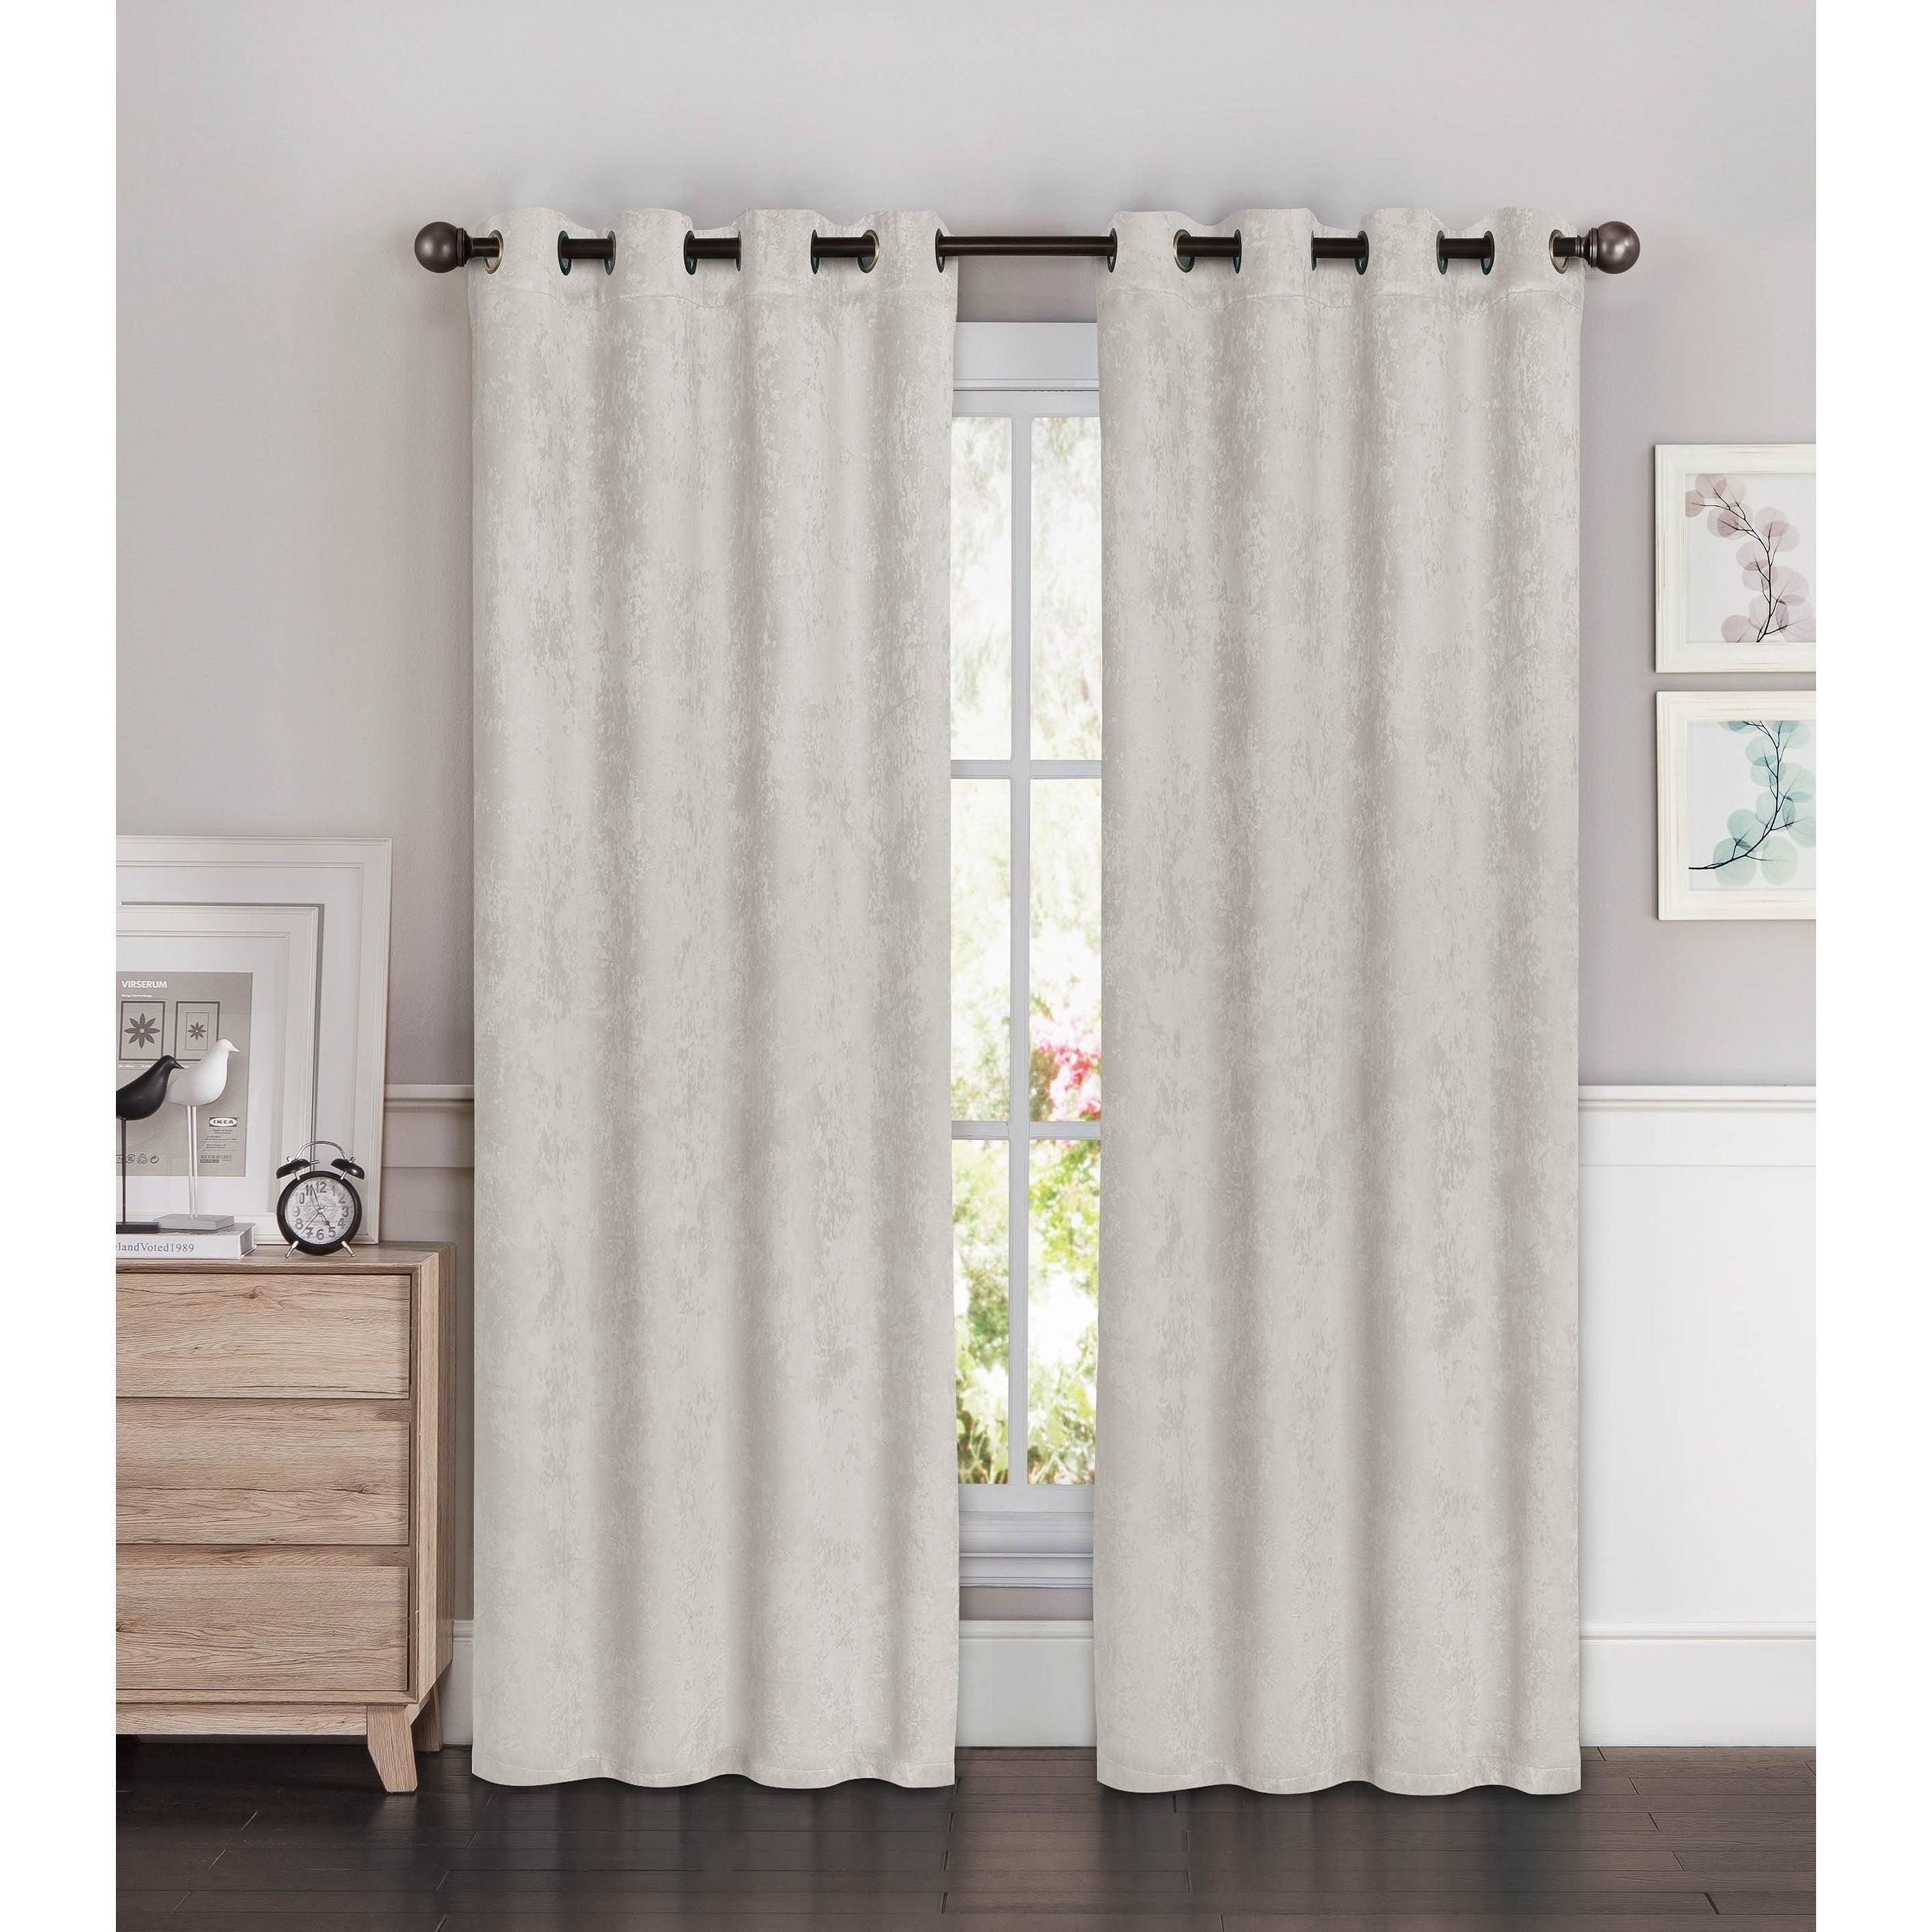 Bella Luna Blackout Curtain Panel Set Of 2 Light Gray 54 W X 96 L